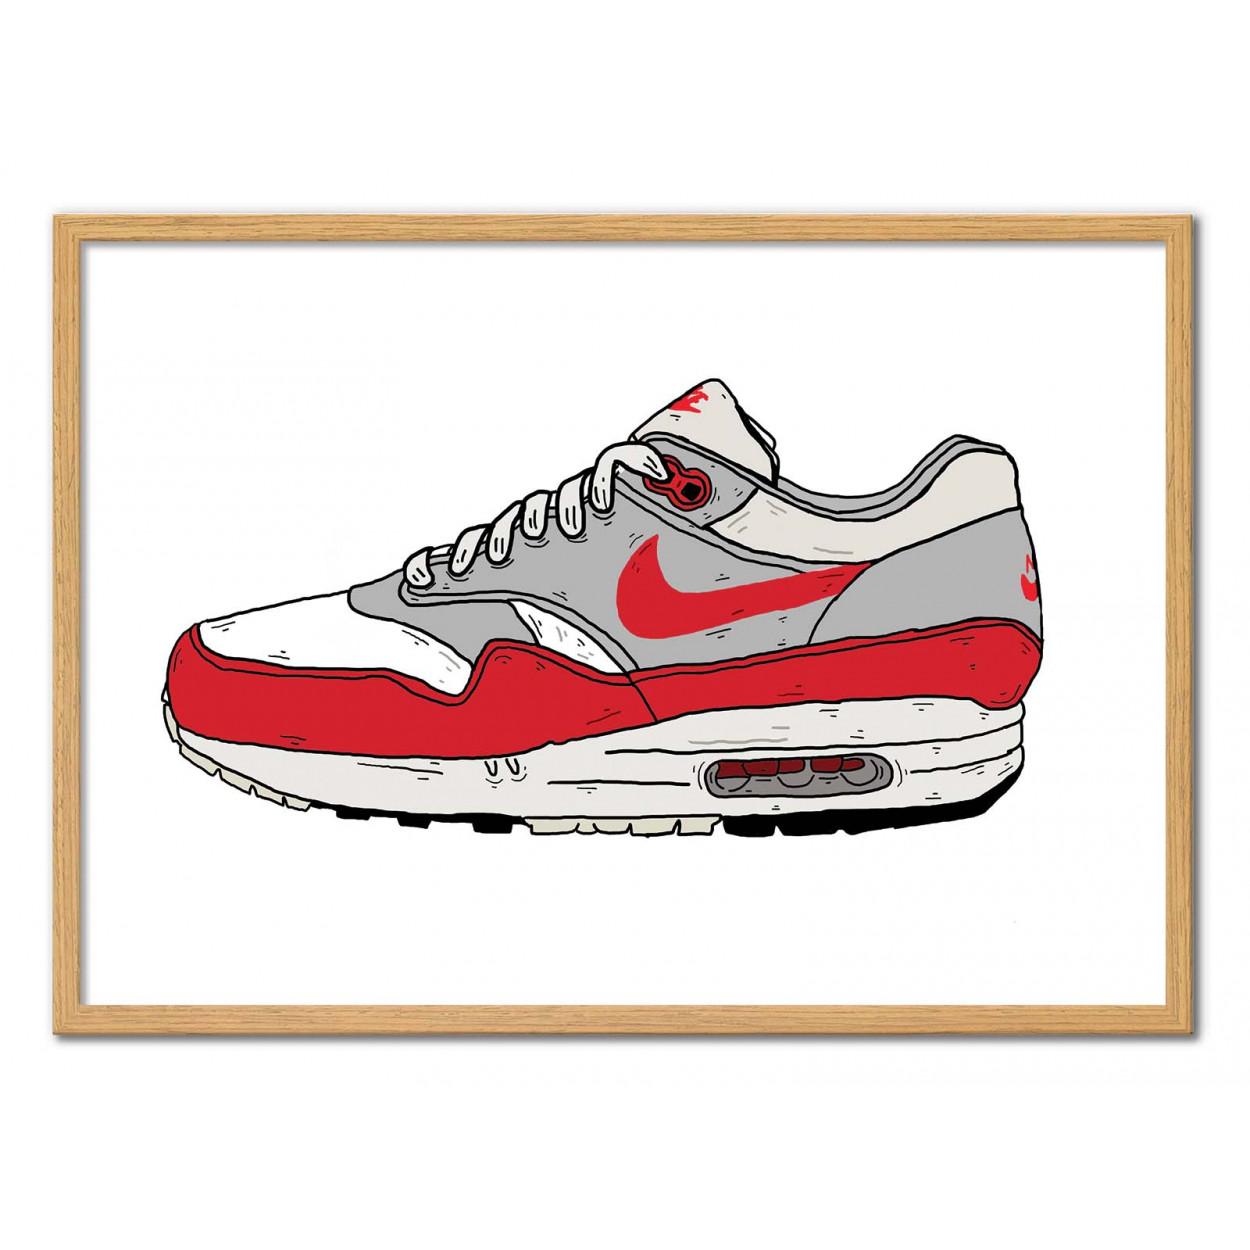 Affiche d'art Sneaker Illustration - Air Max - Nick Cocozza